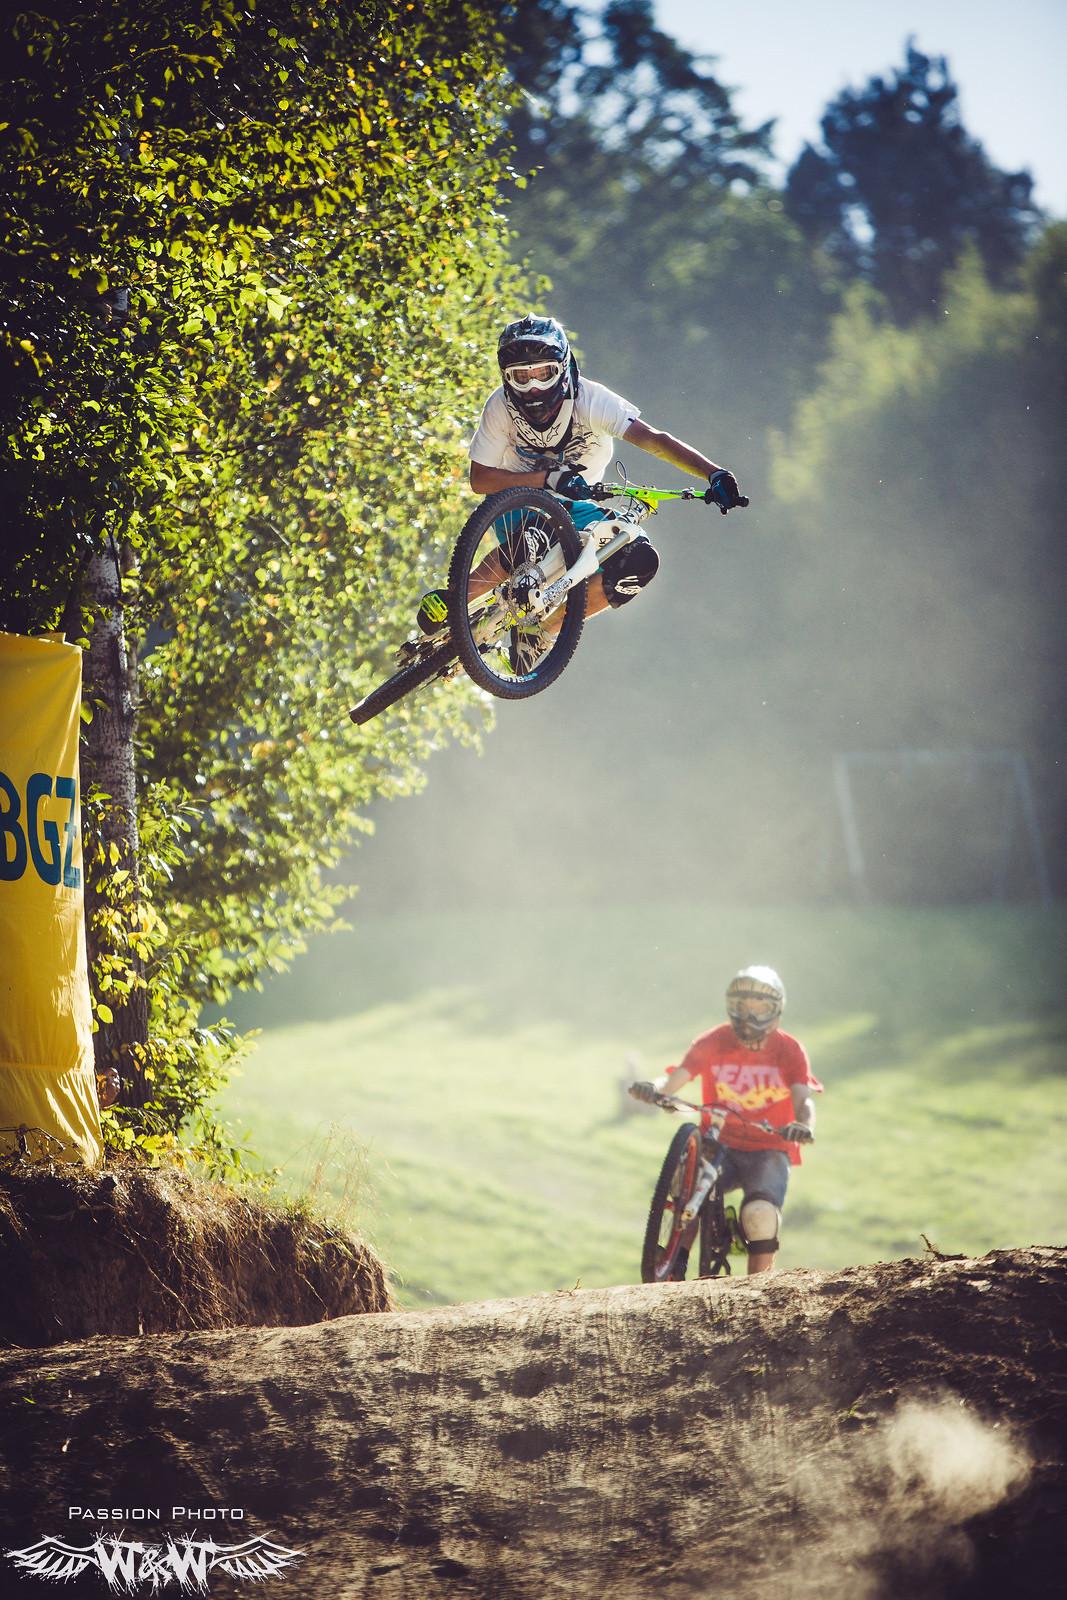 TT - JawsMtb - Mountain Biking Pictures - Vital MTB